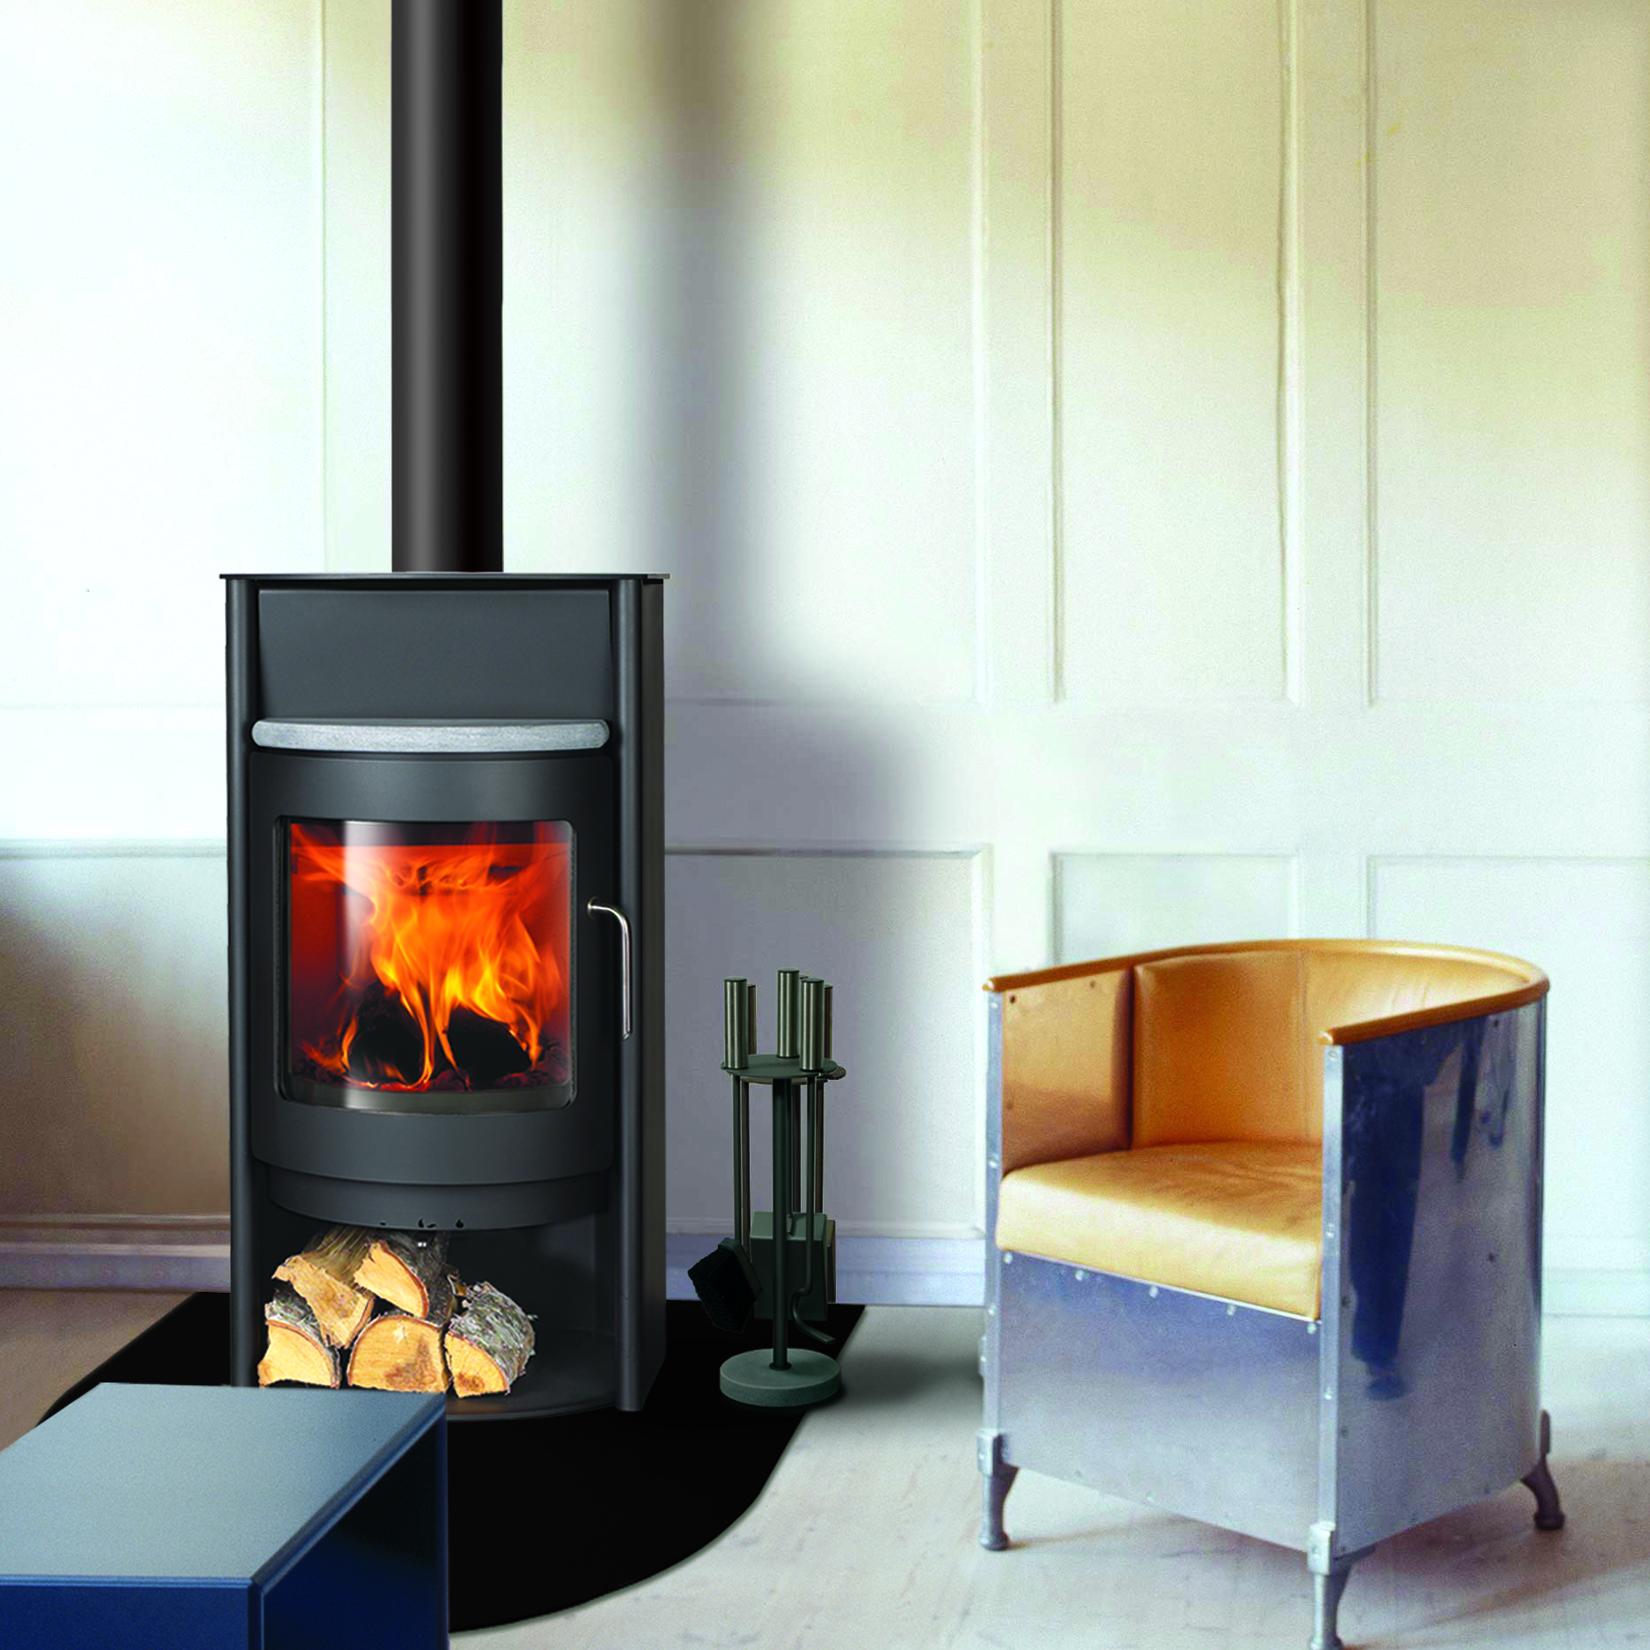 Outdoor Freestanding Wood Fireplace